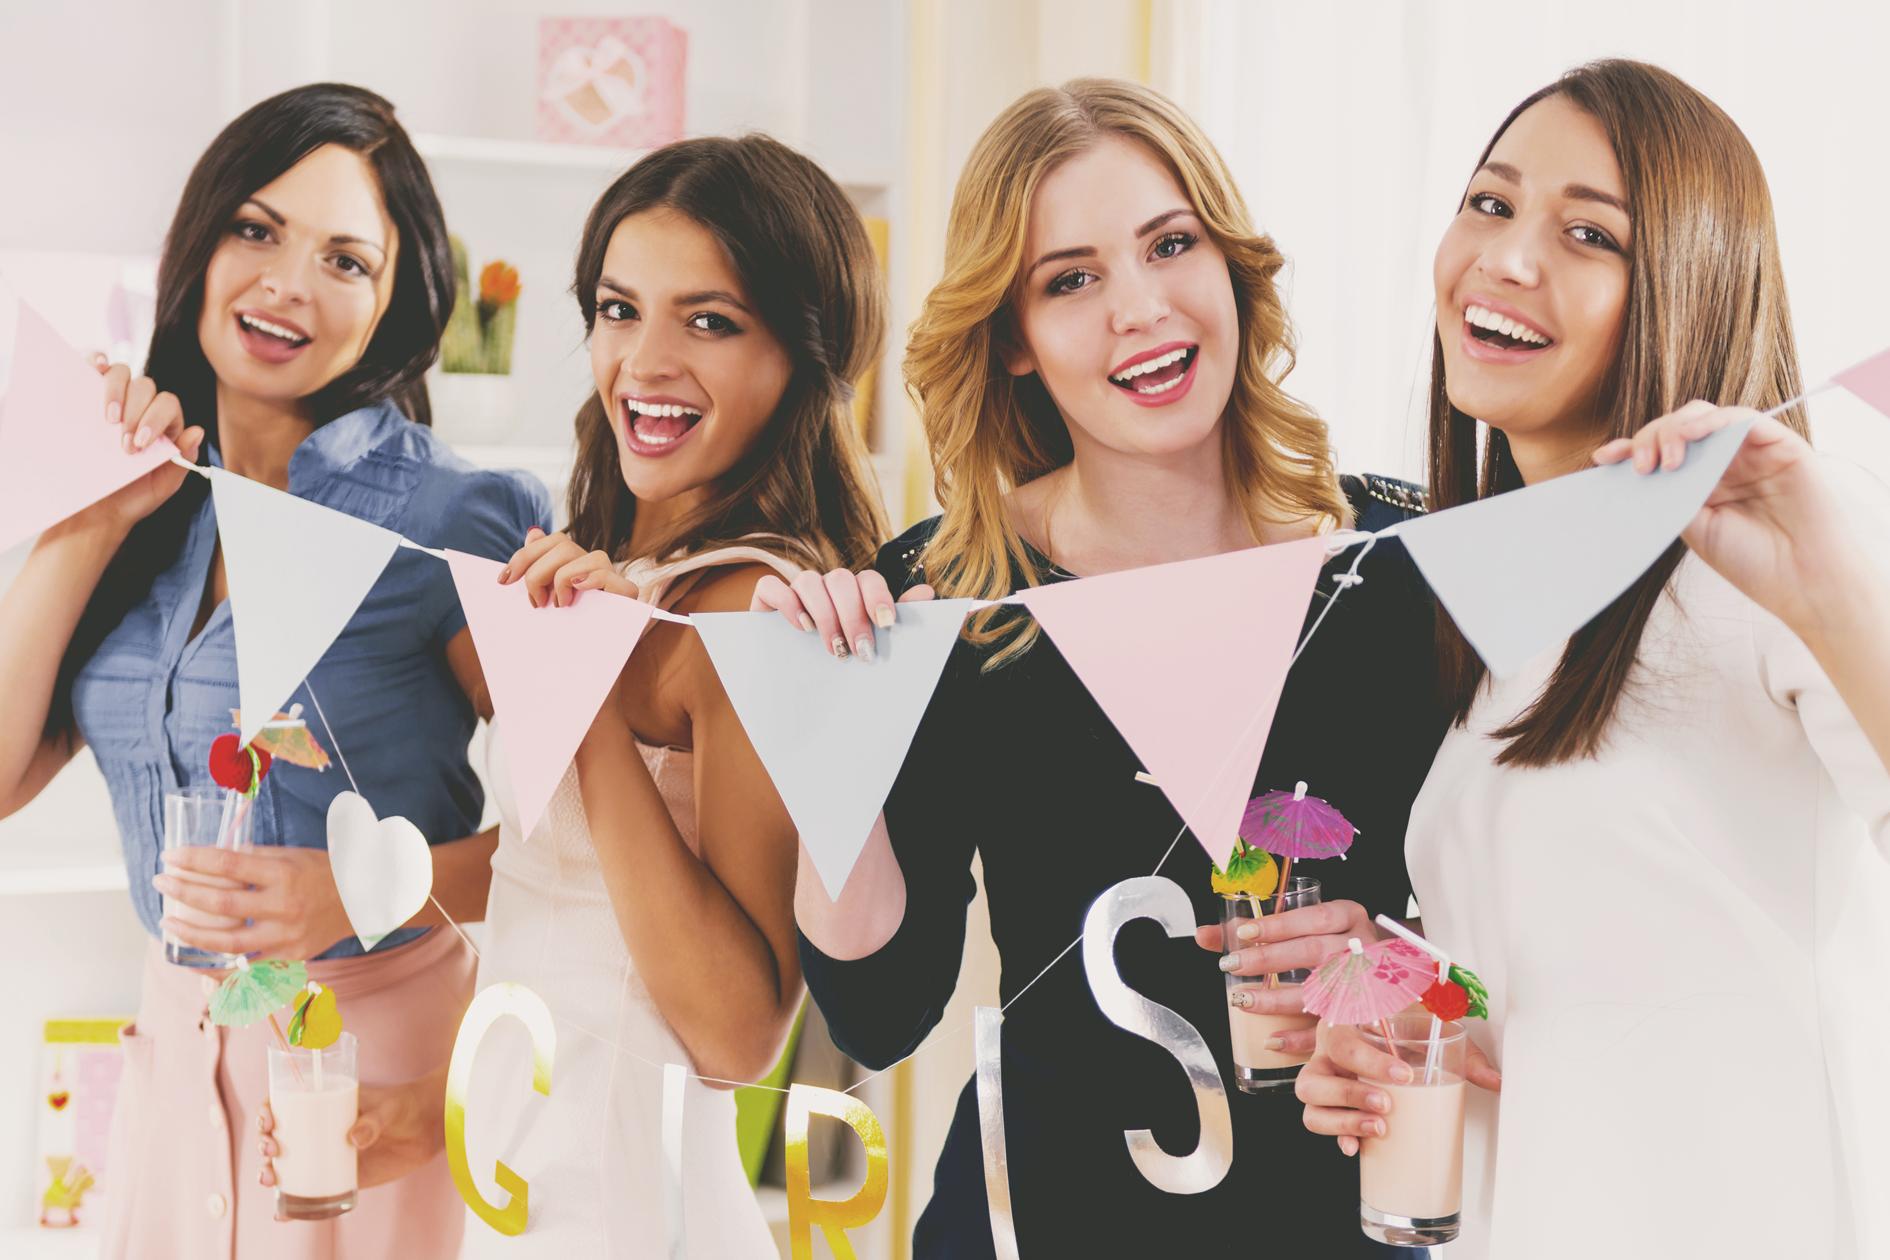 Host Your Bridal Party Here - Lily & Roo Nail Salon, Kitsilano, Vancouver (BC)